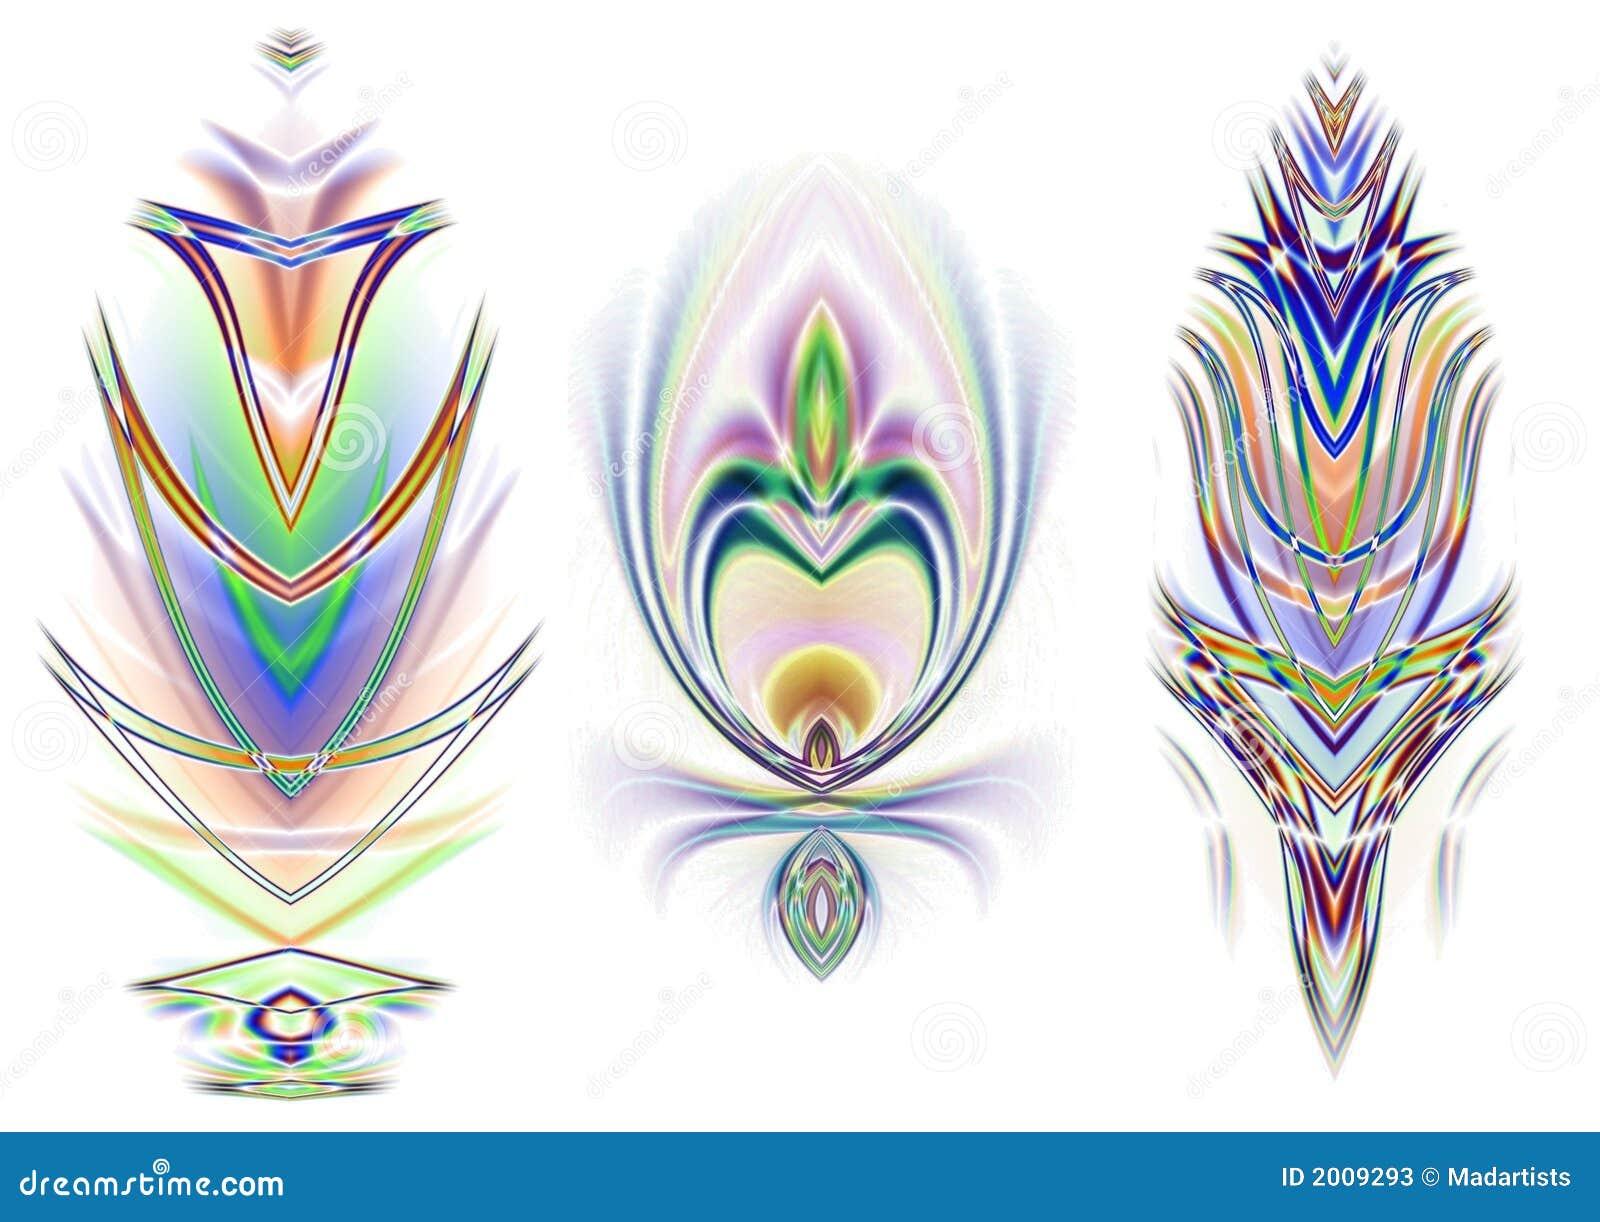 3 Elements Of Design : Decorative design elements stock photos image